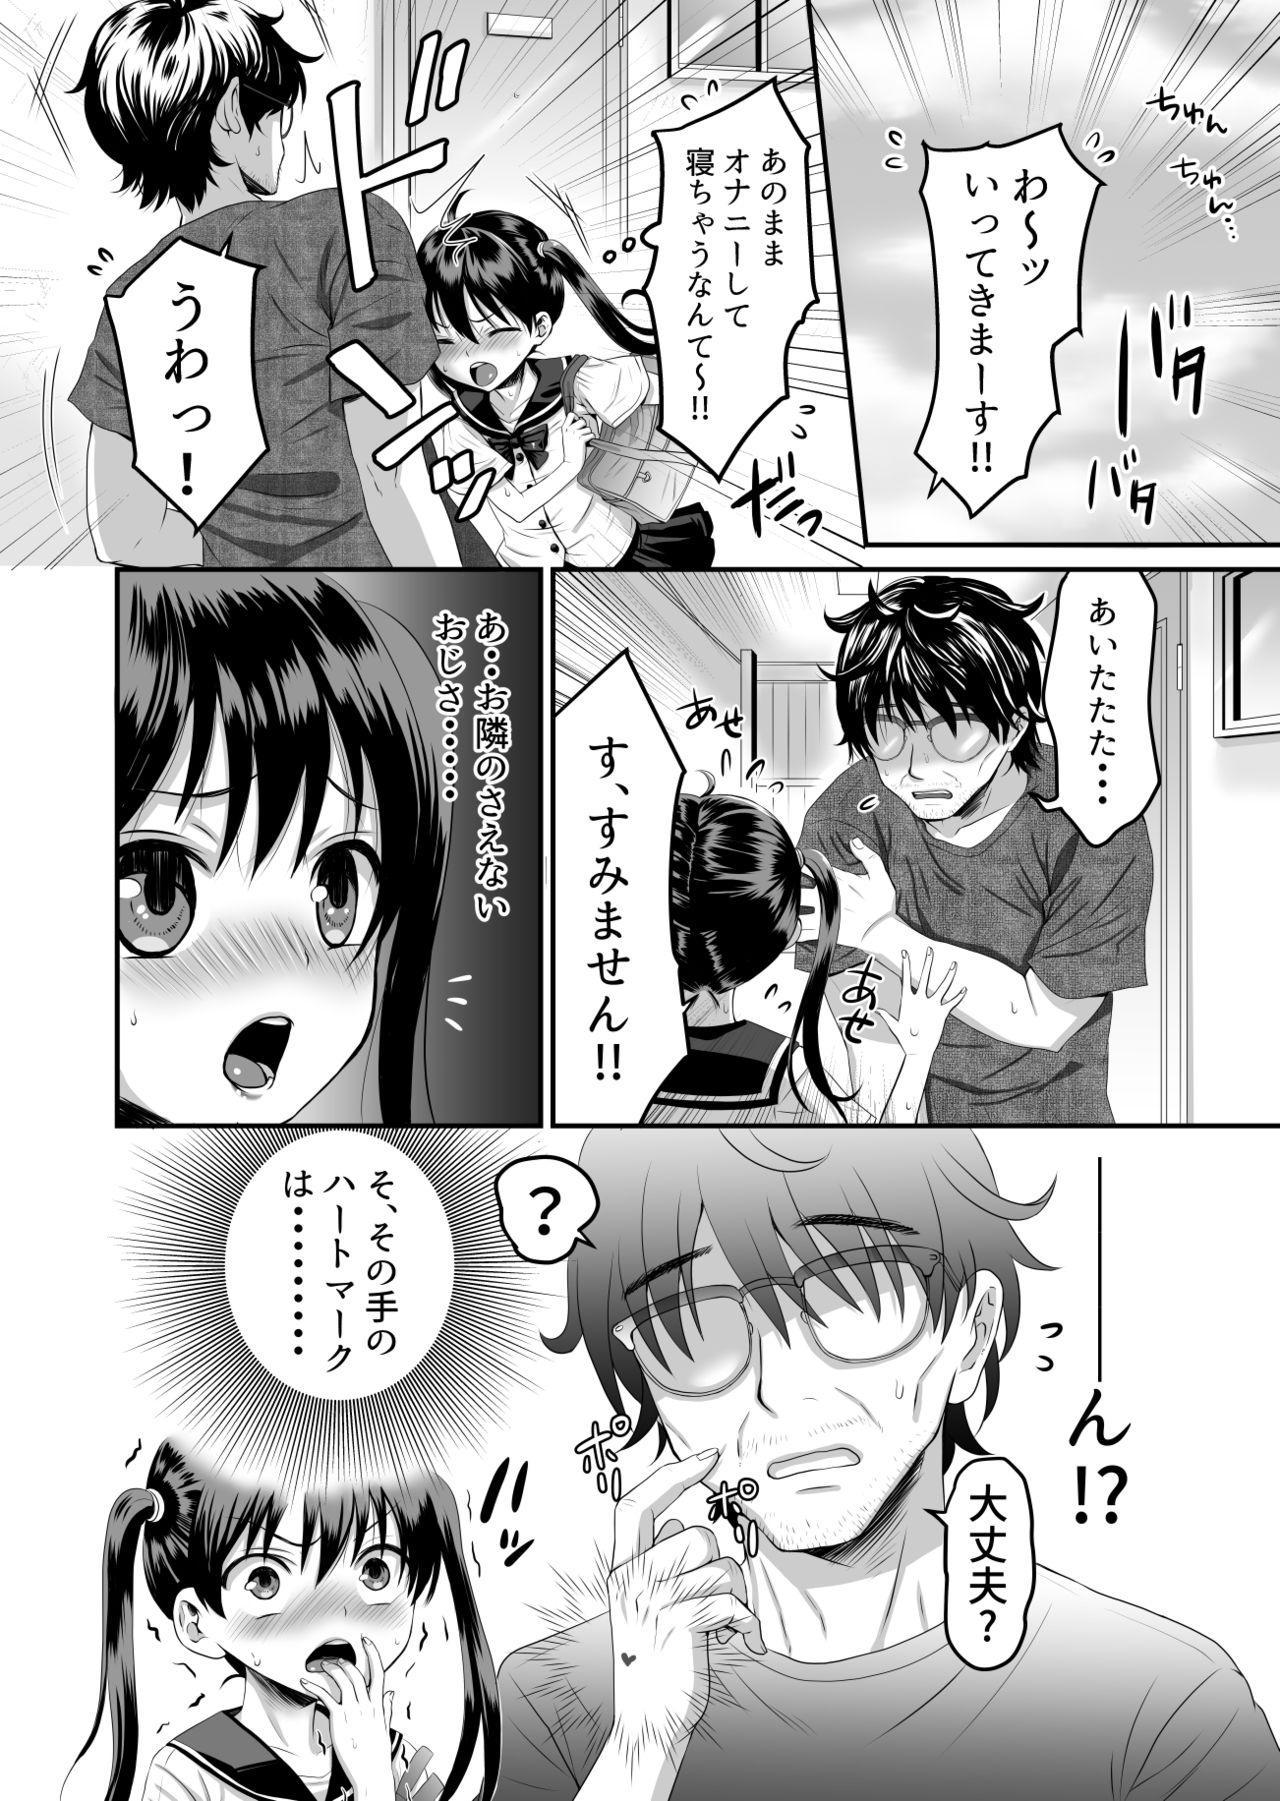 Otonari-san wa AV Danyuu 5